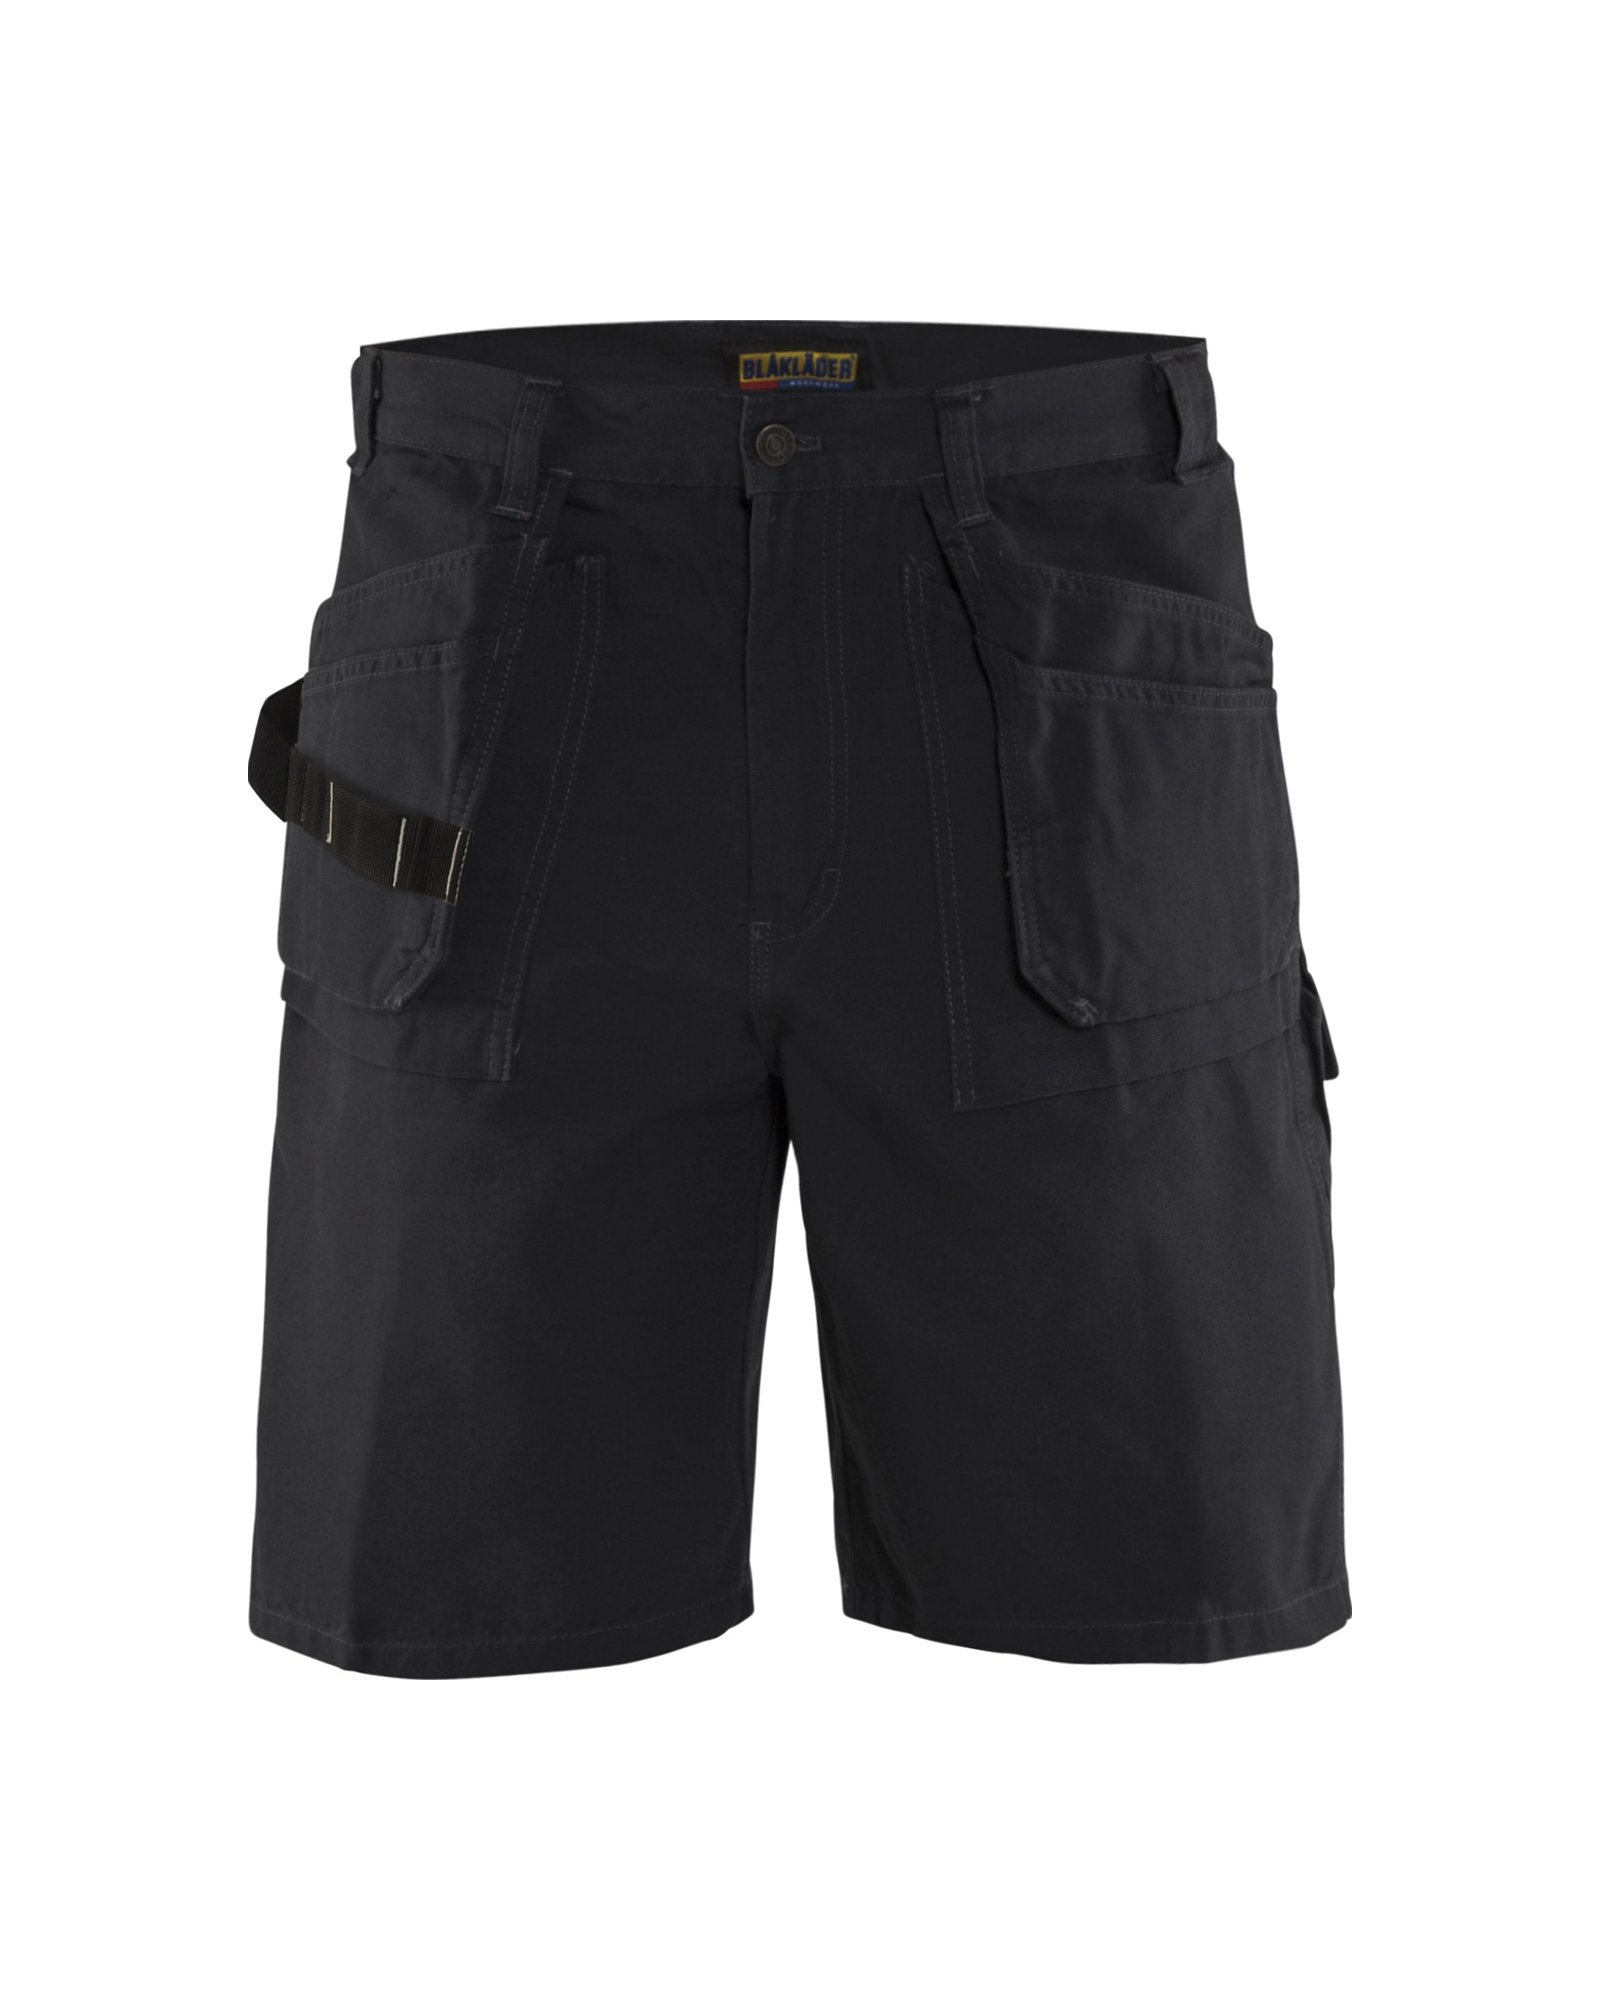 Blaklader Bantam Work Shorts Black 44